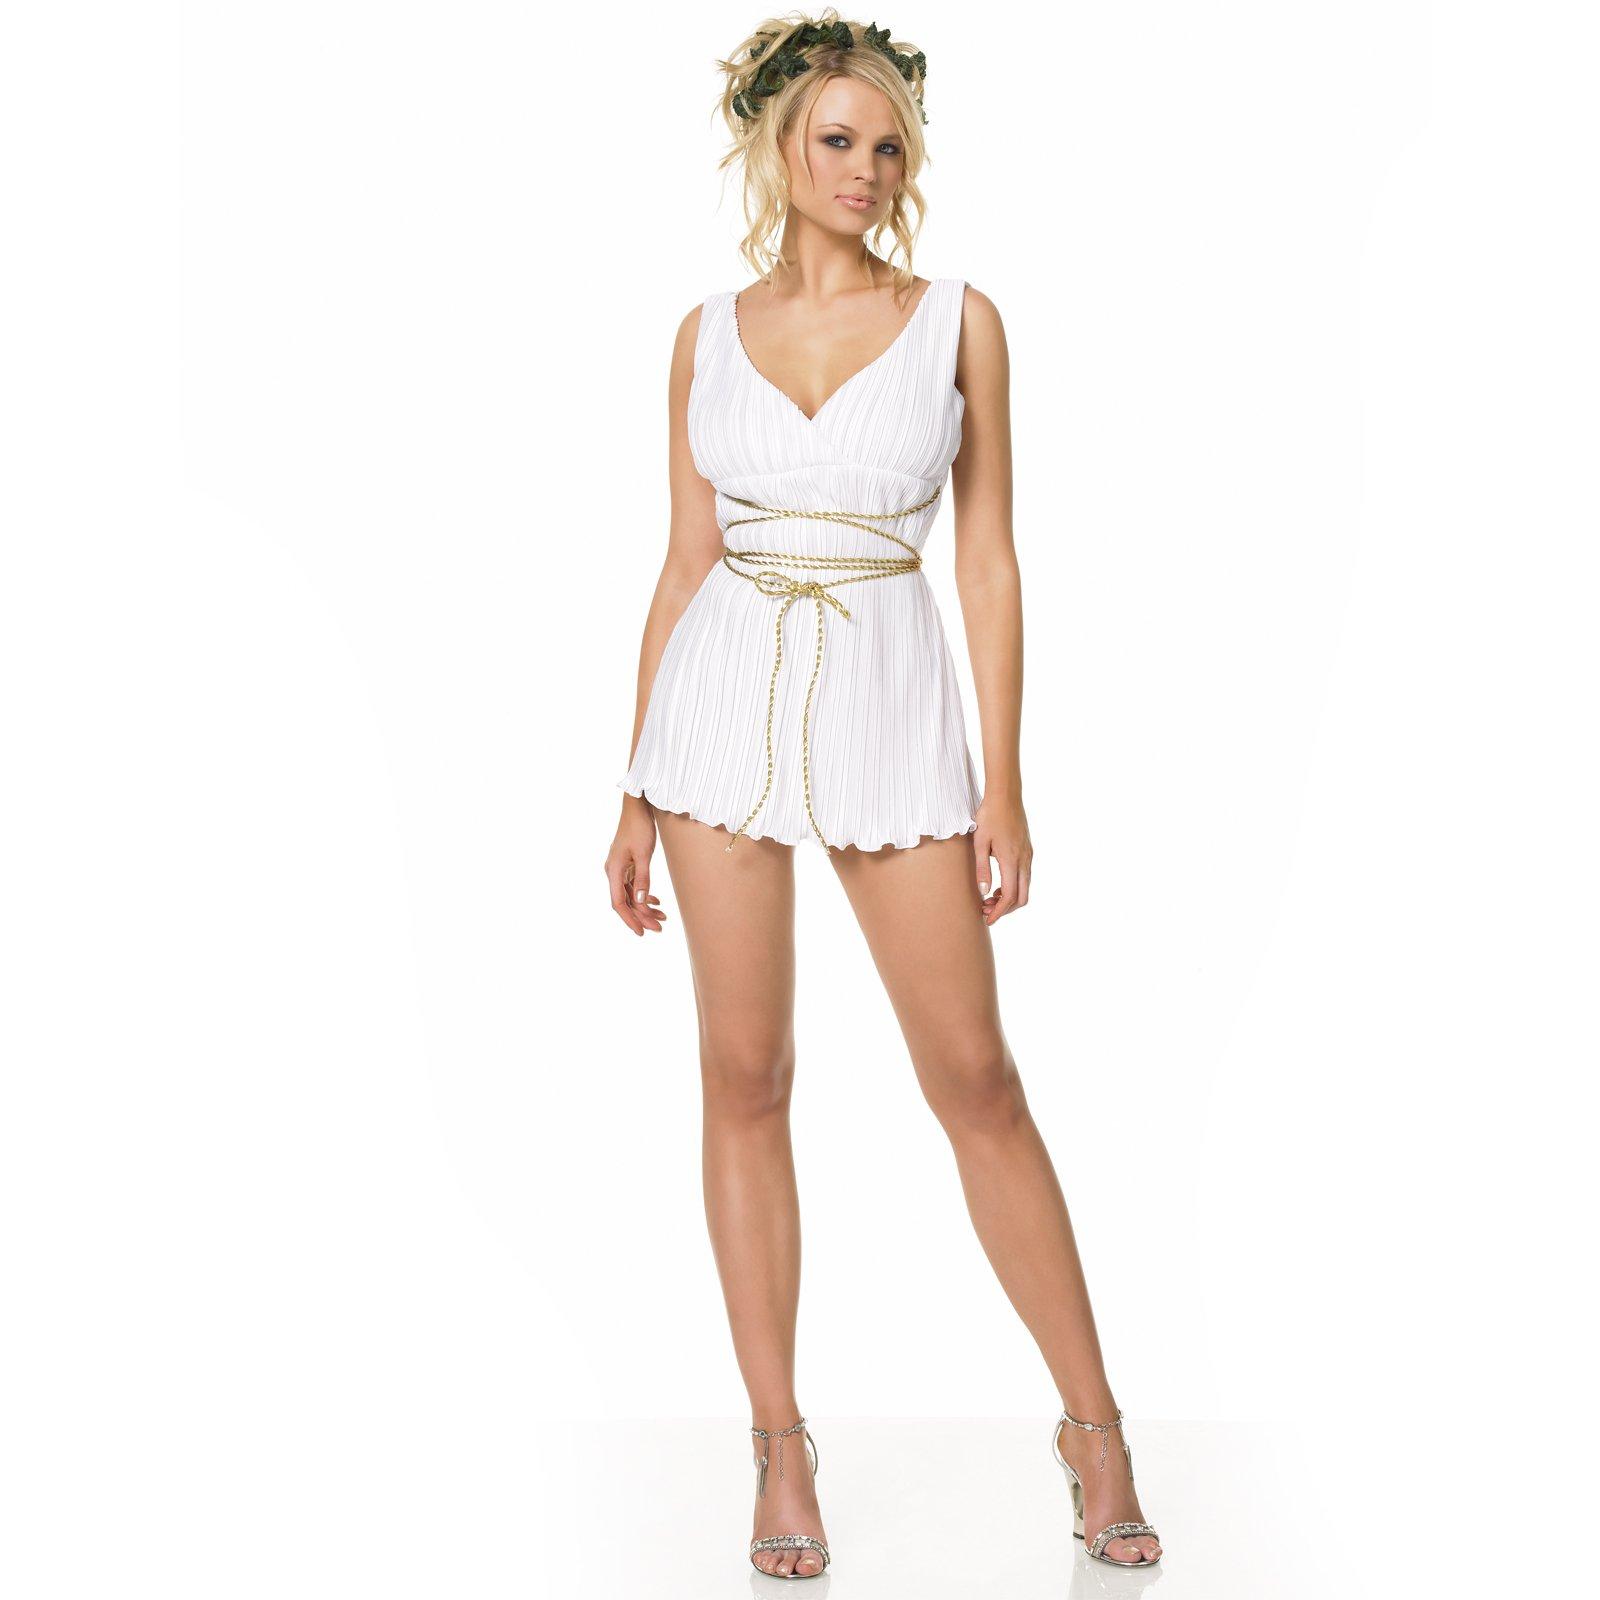 Greek Woman Sex 109